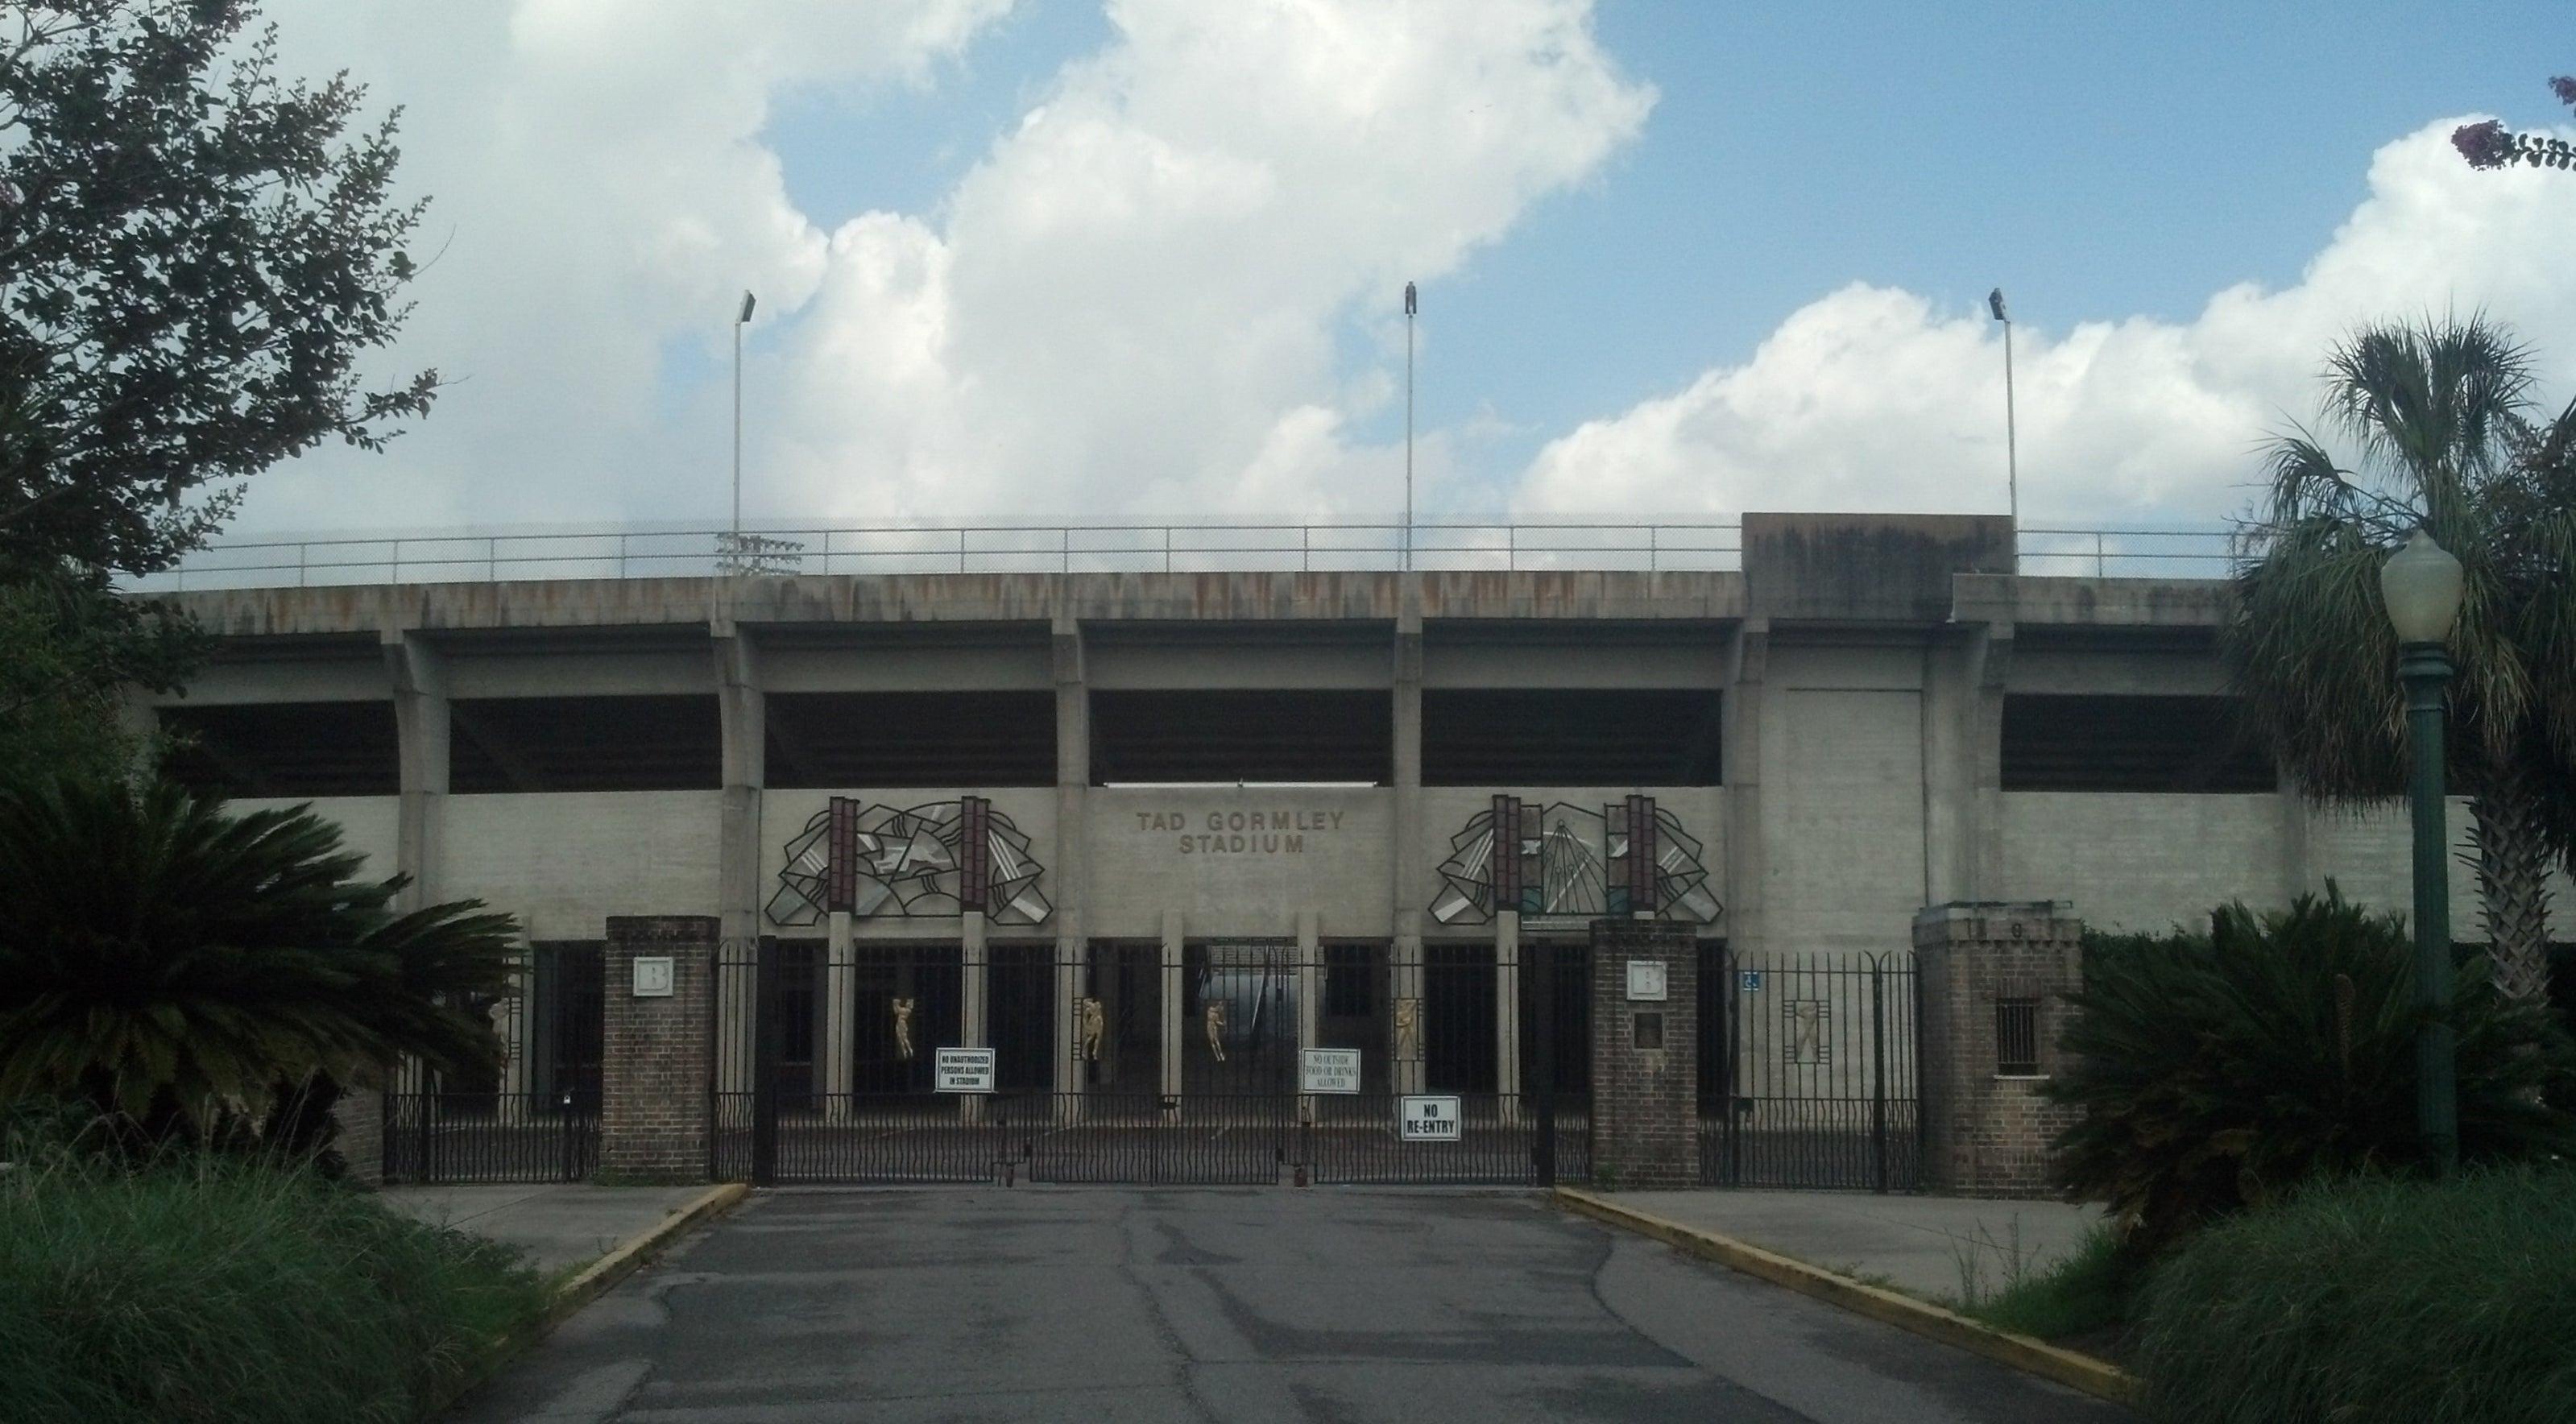 Tad Gormley Stadium